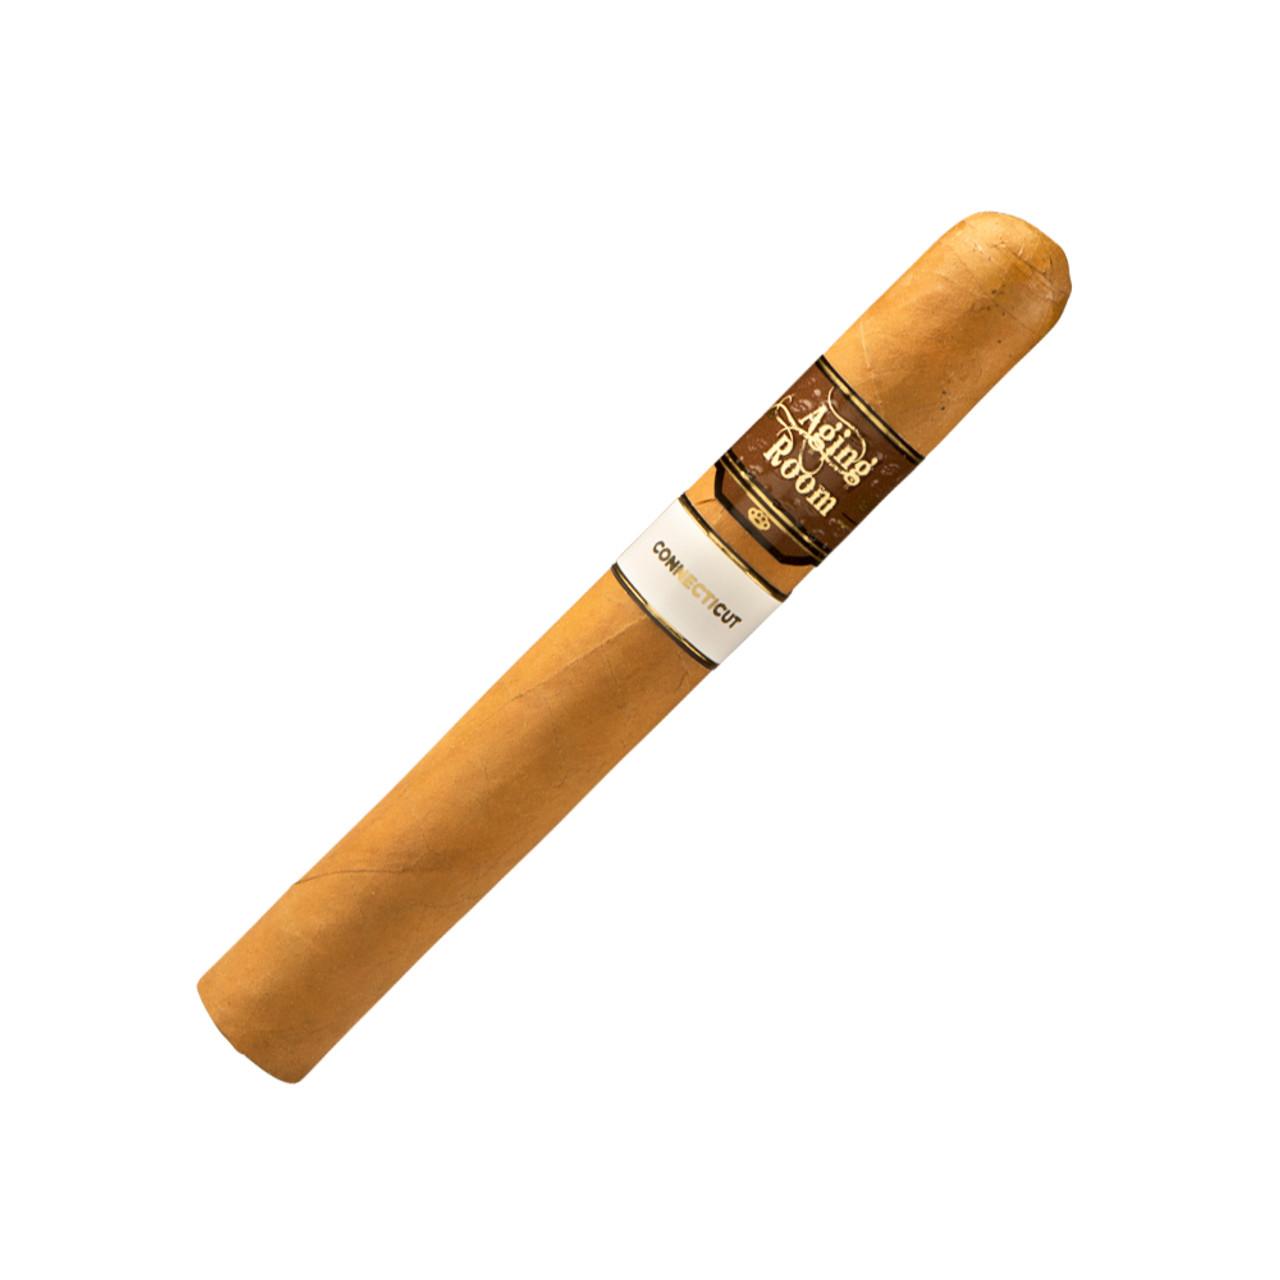 Aging Room Core by Rafael Nodal Vivase Cigars - 6 x 50 (Box of 20)